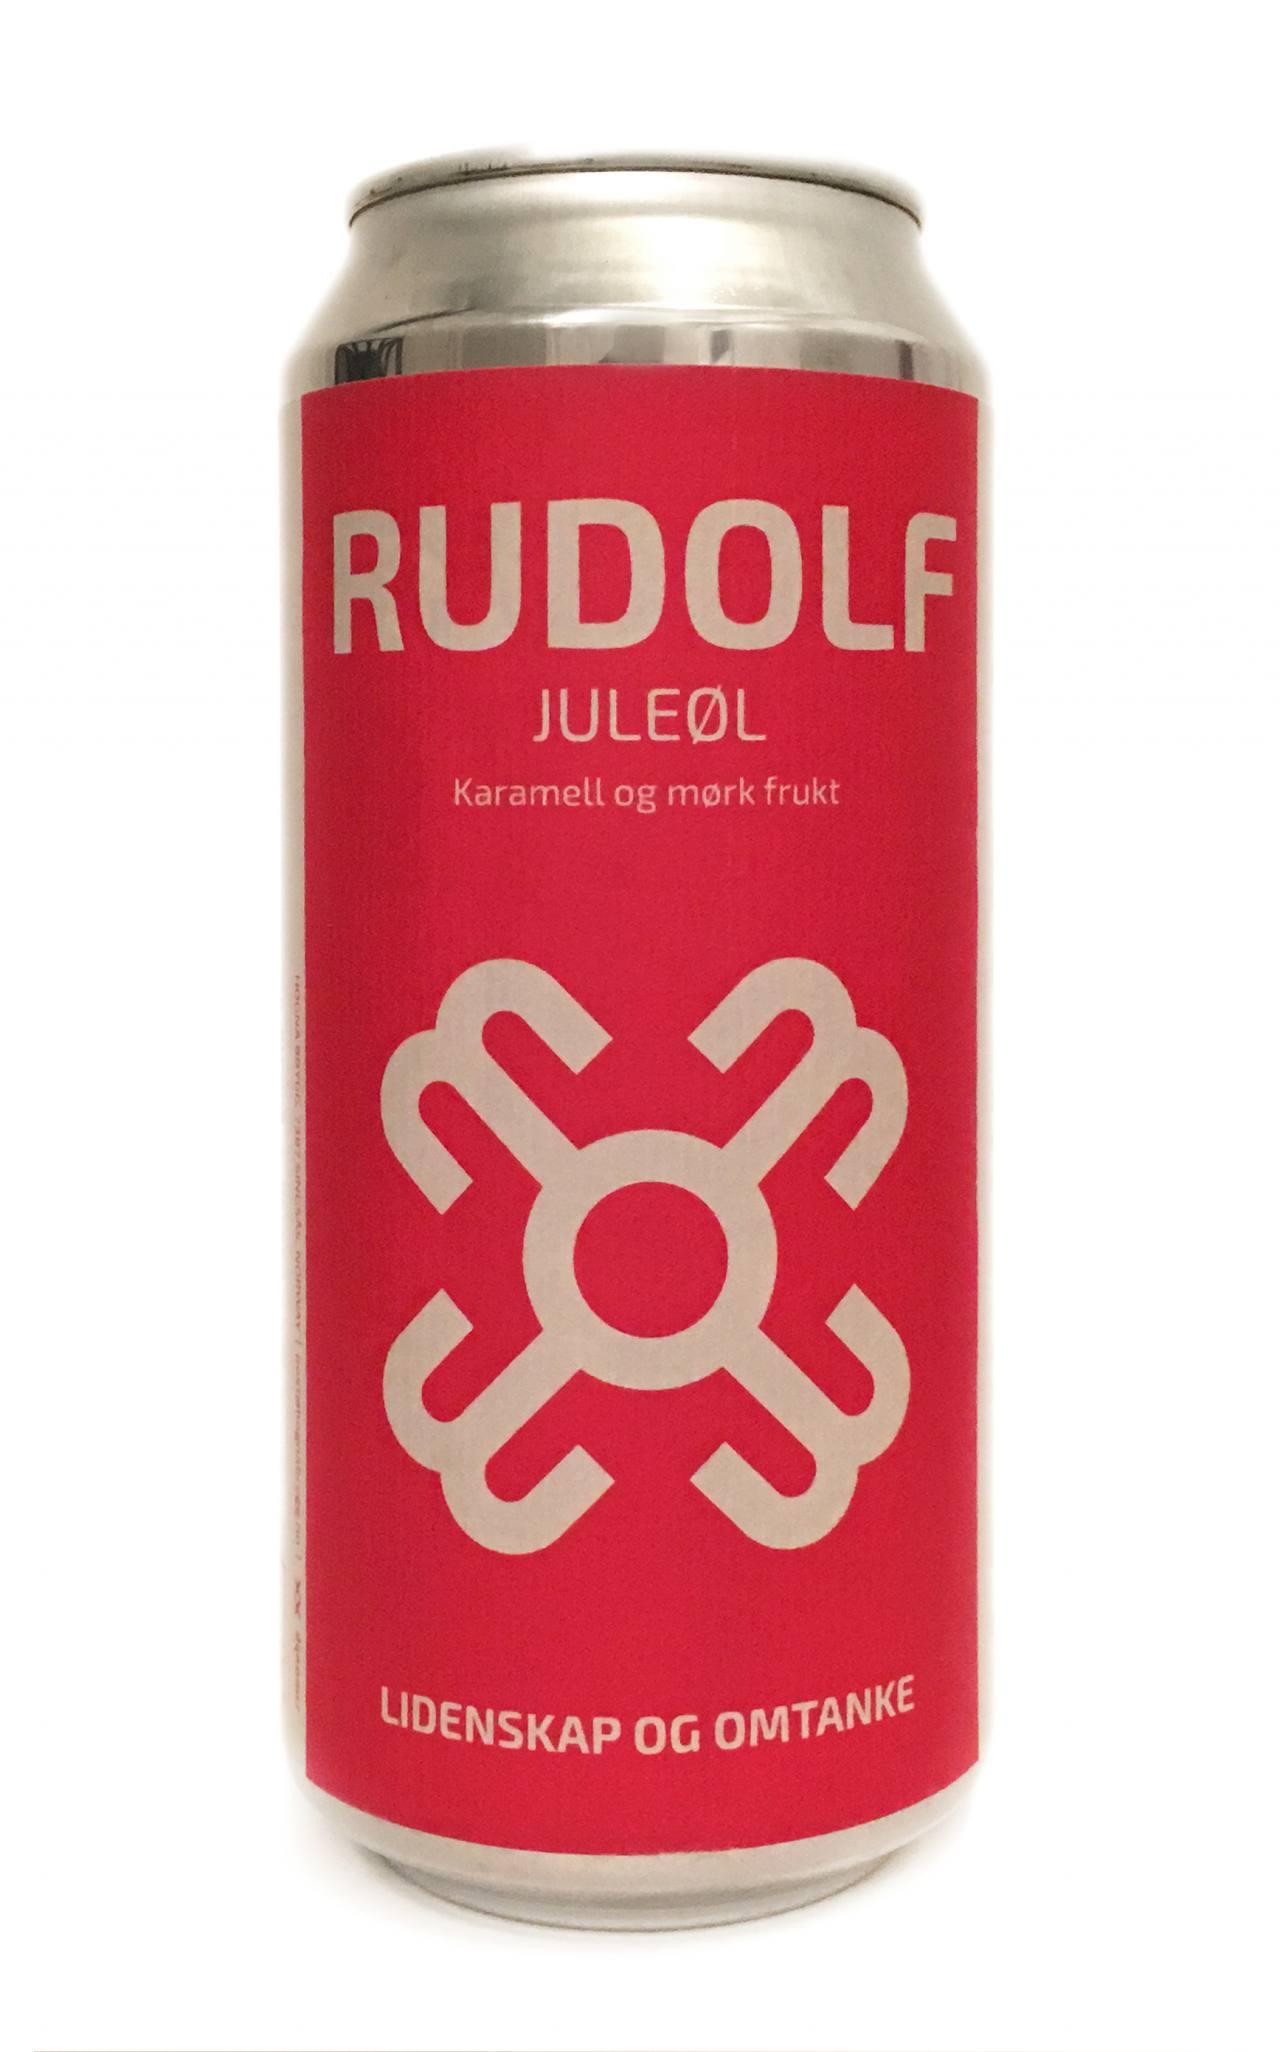 hogna-brygg-ol-rudolf-juleol